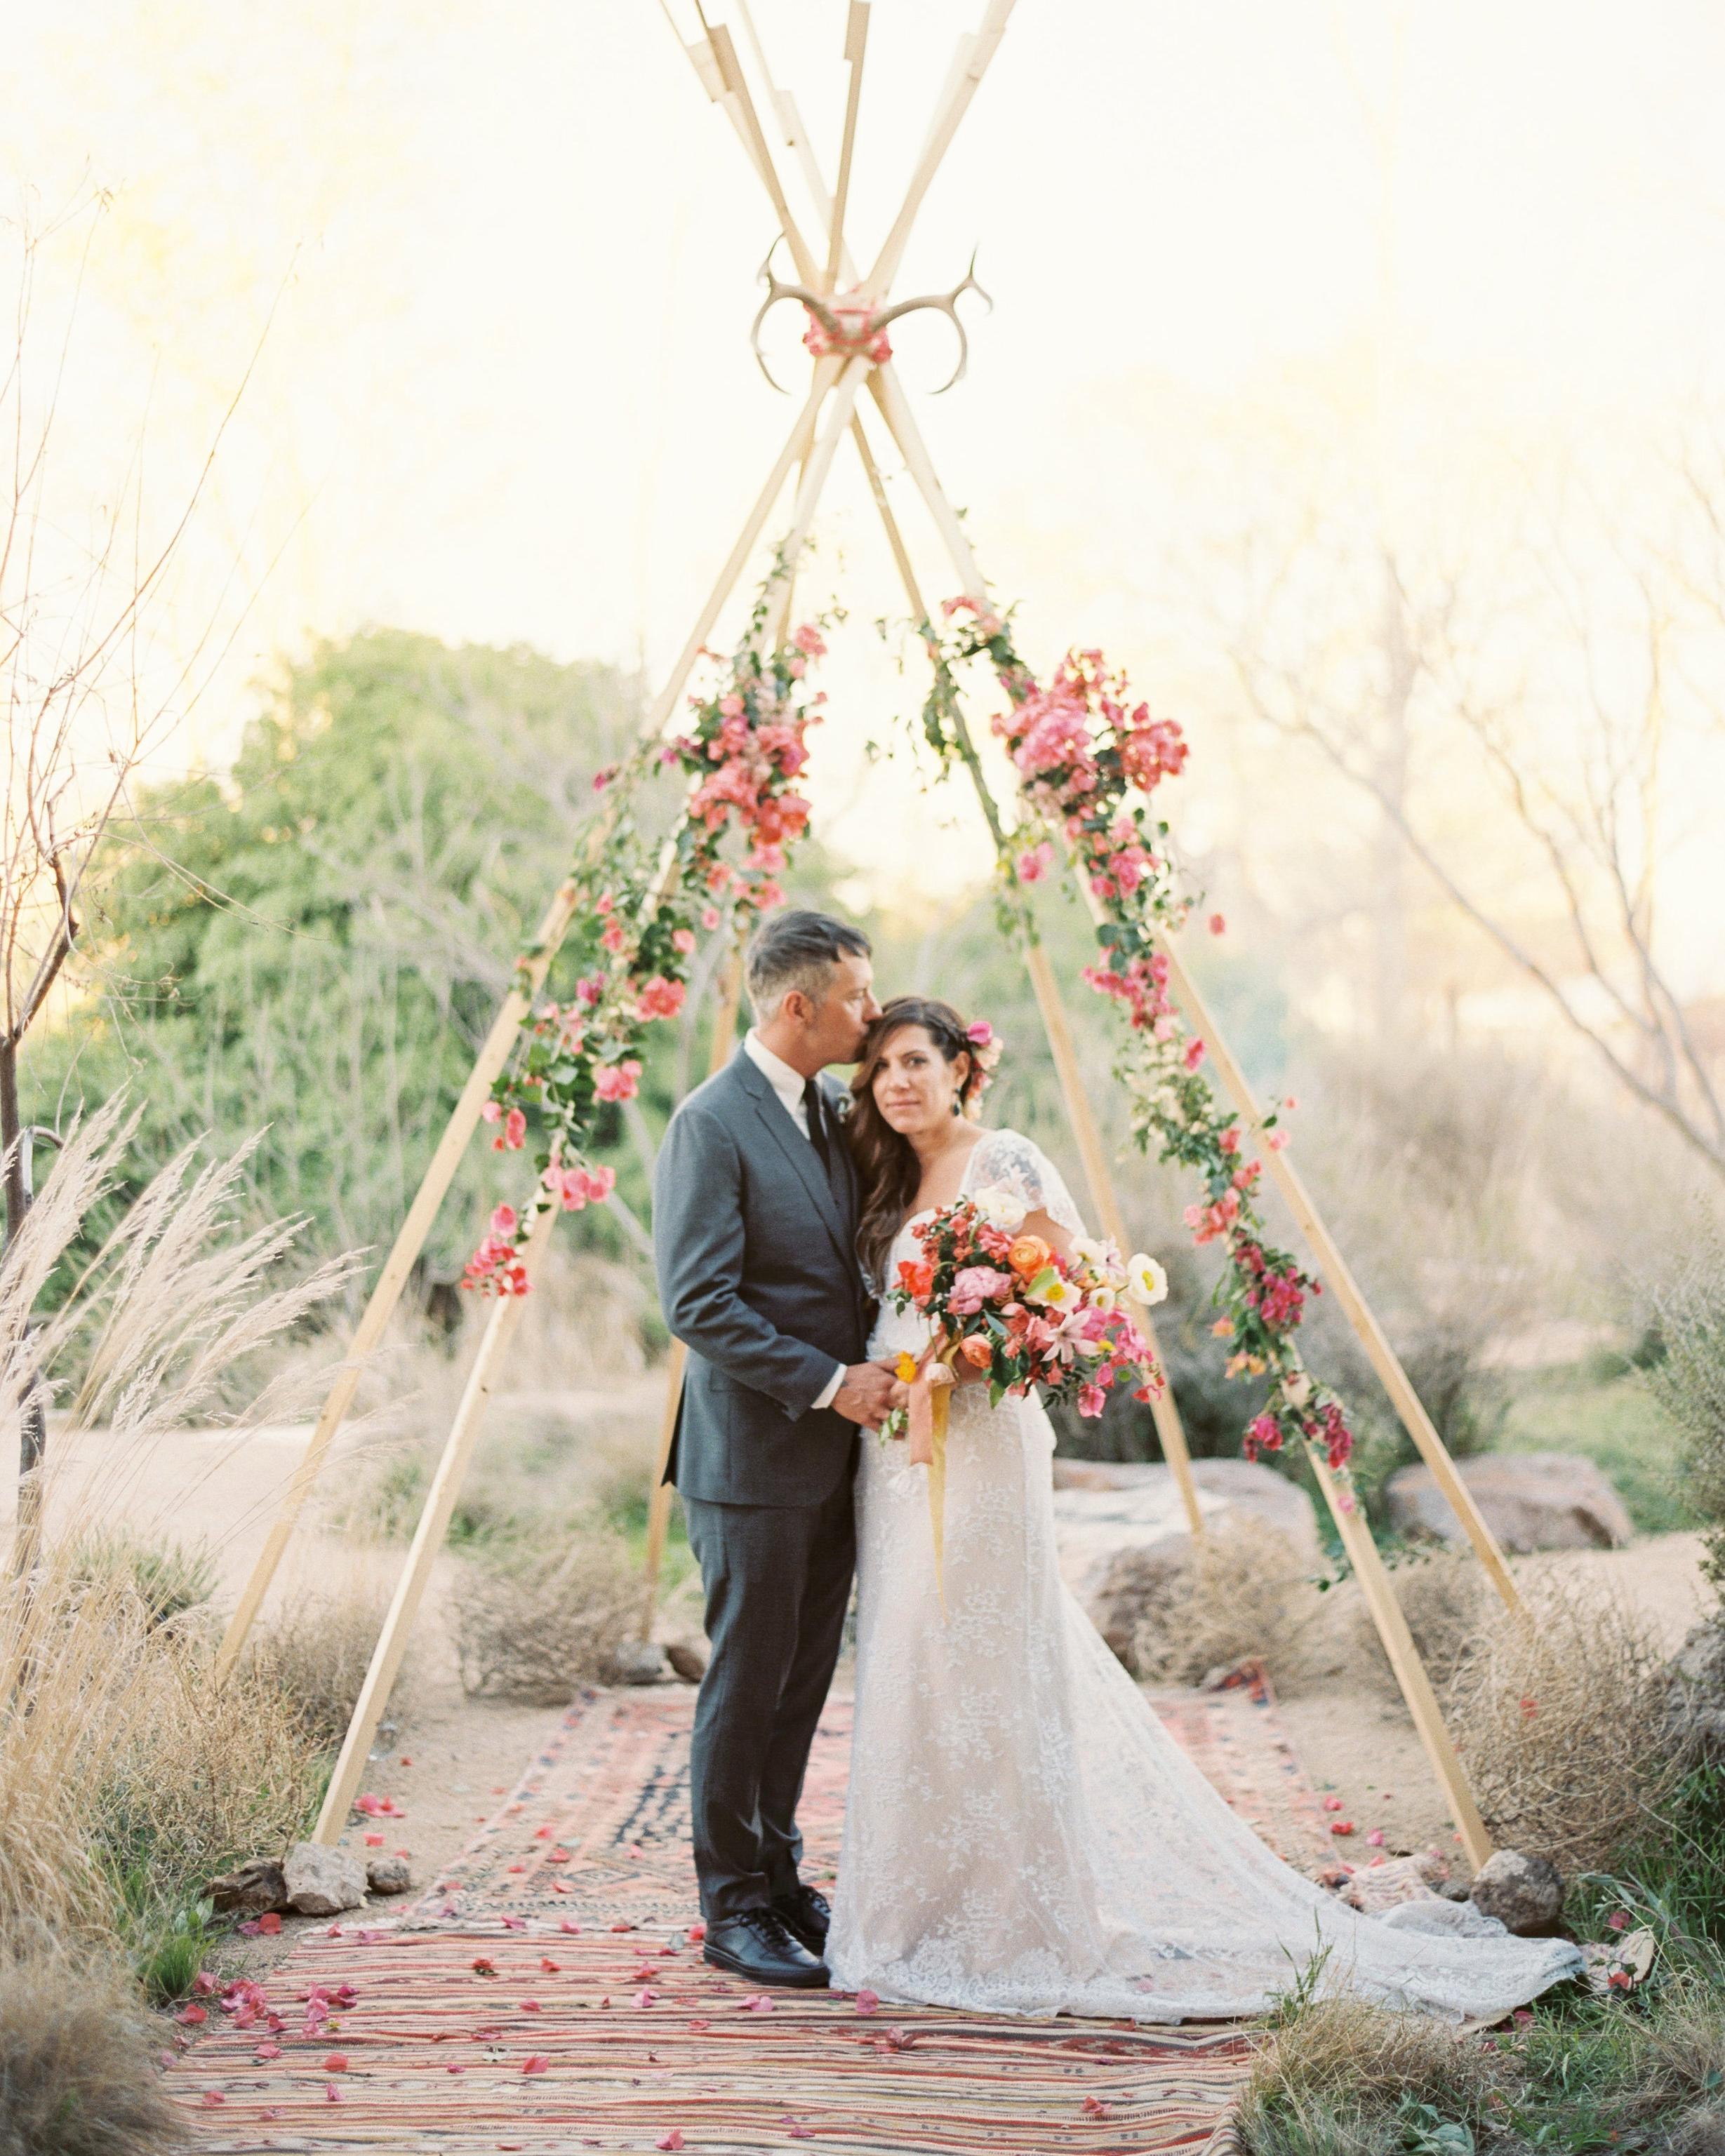 lara-chad-wedding-couple-513-s112306-1115.jpg